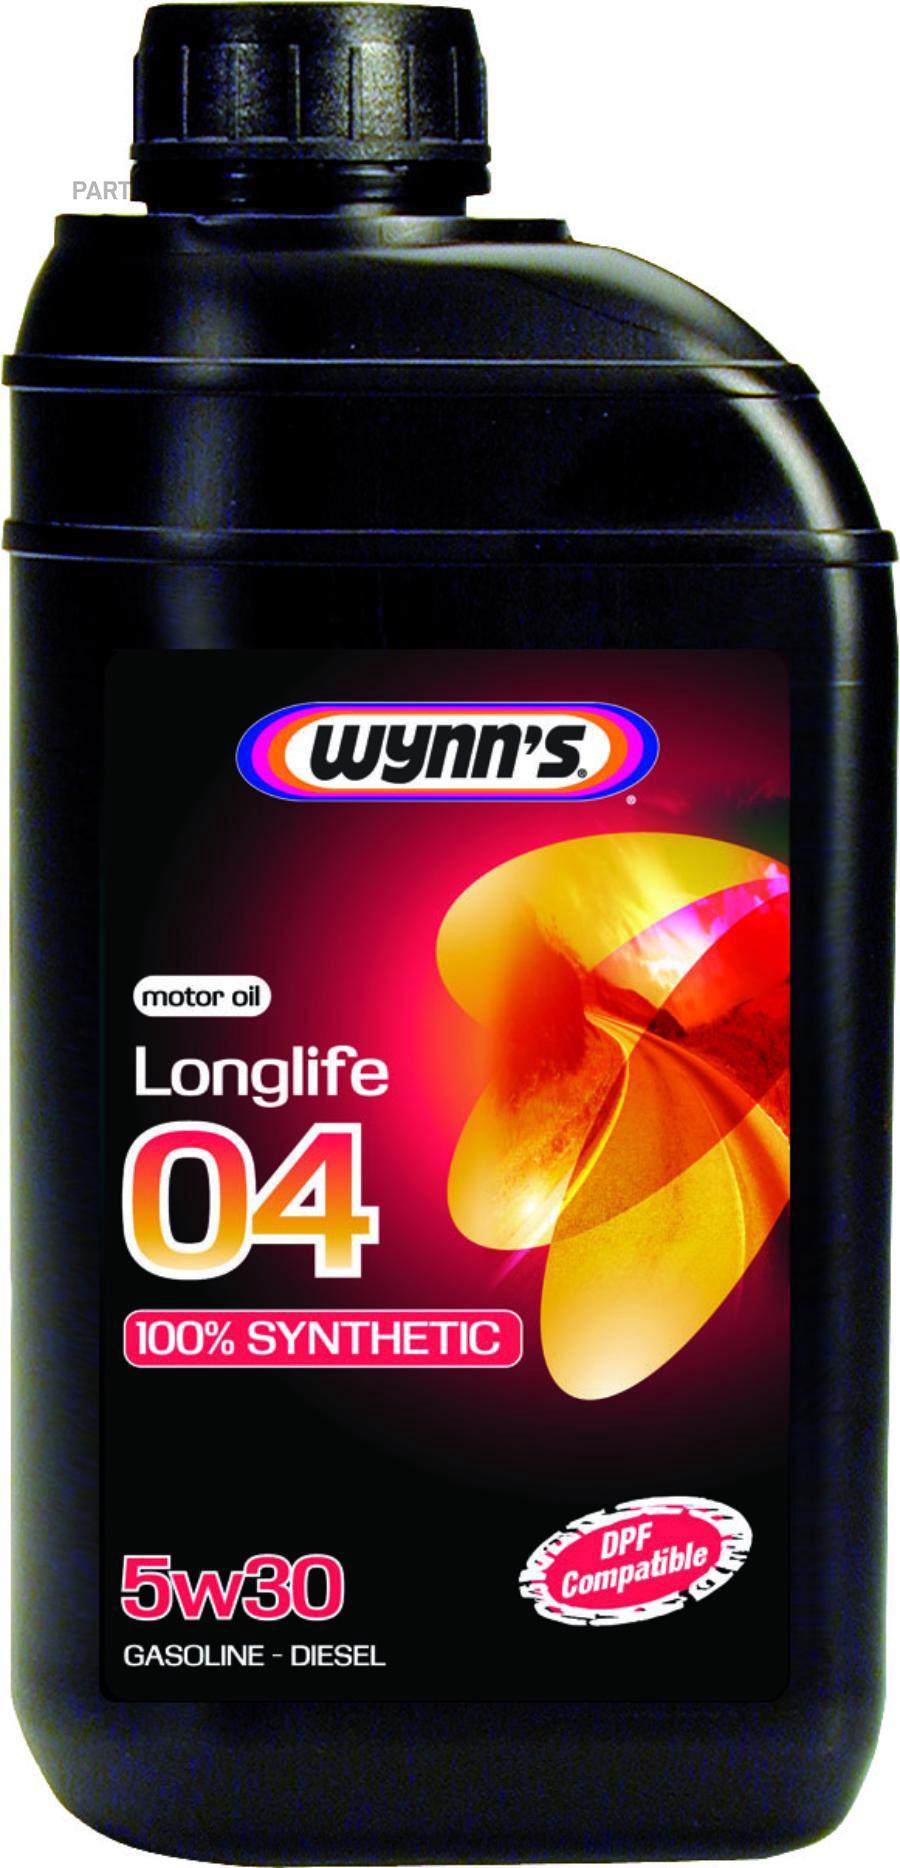 Моторное масло синтетическое WYNNS LONGLIFE 04 5W30, 1л